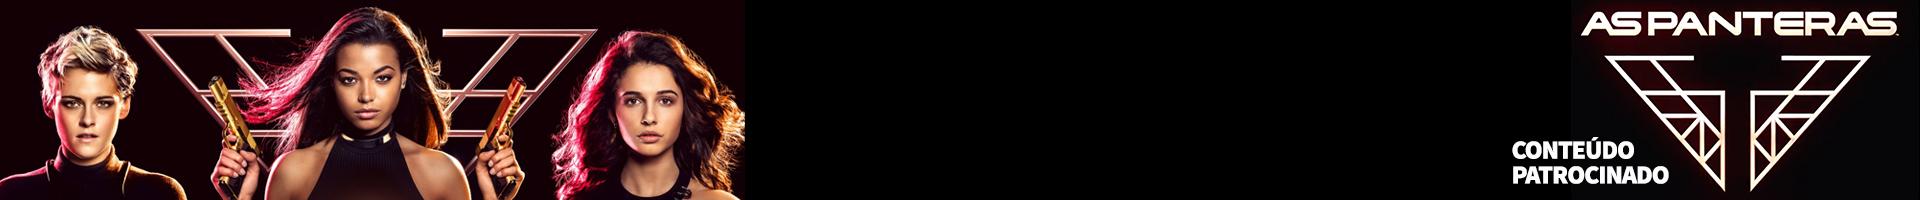 as-panteras